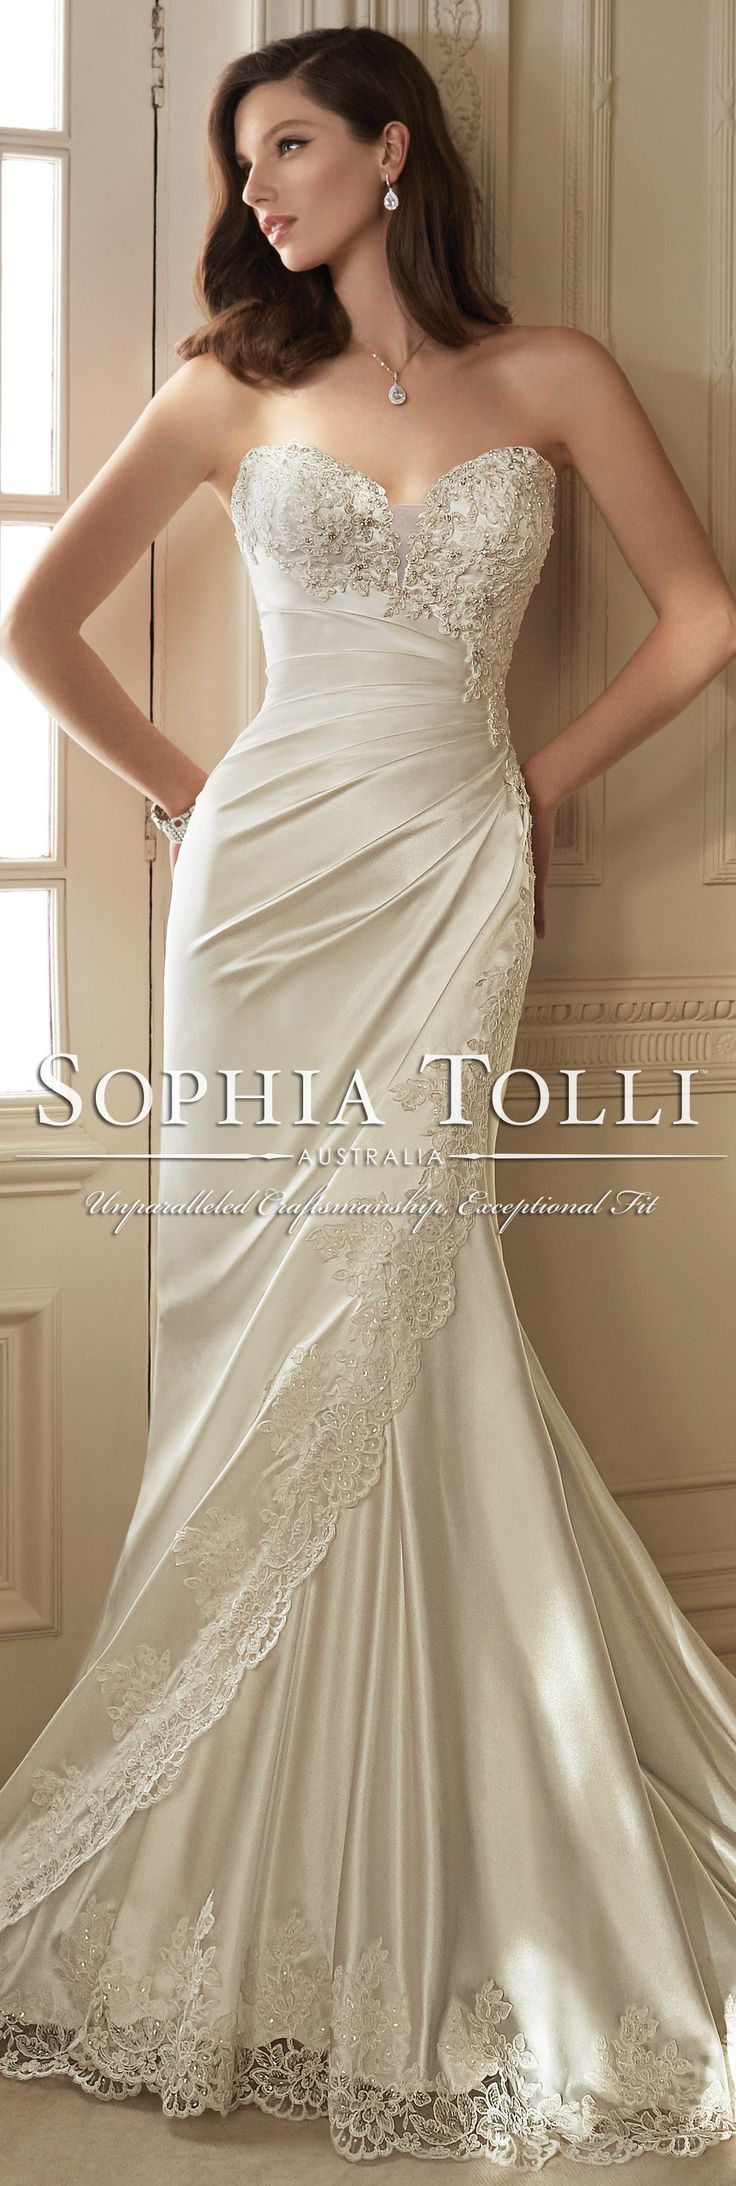 The Sophia Tolli Spring 2016 Wedding Dress Collection - Style No. Y11642 - Morrigan #satinweddingdress